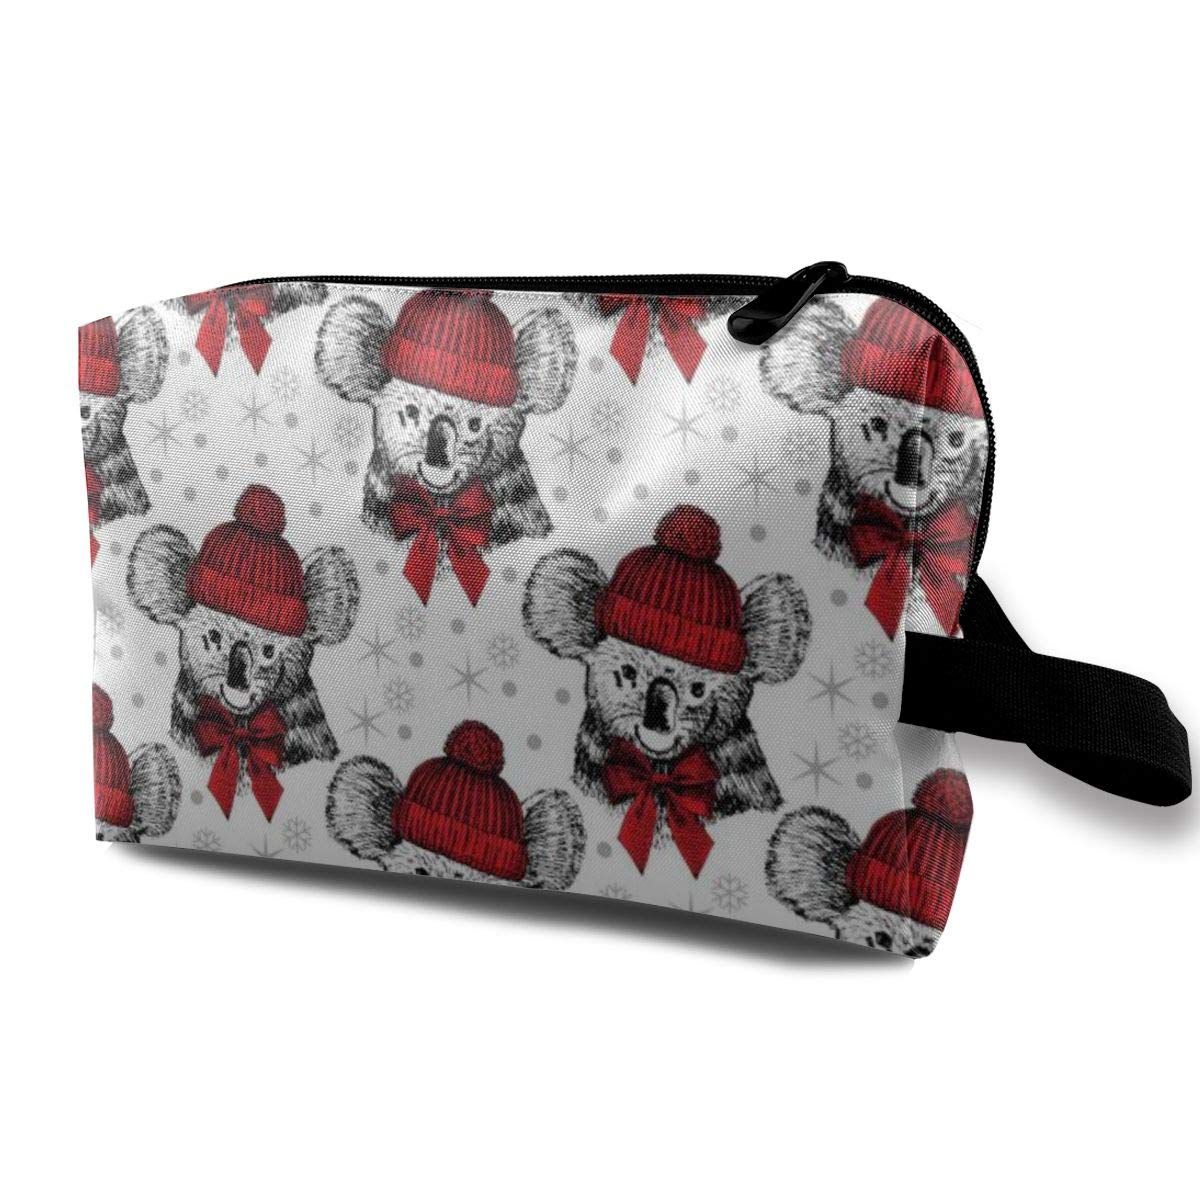 Koala Hat Toiletry Bag Multifunction Cosmetic Bag Portable Makeup Pouch Travel Organizer Bag For Women Girls